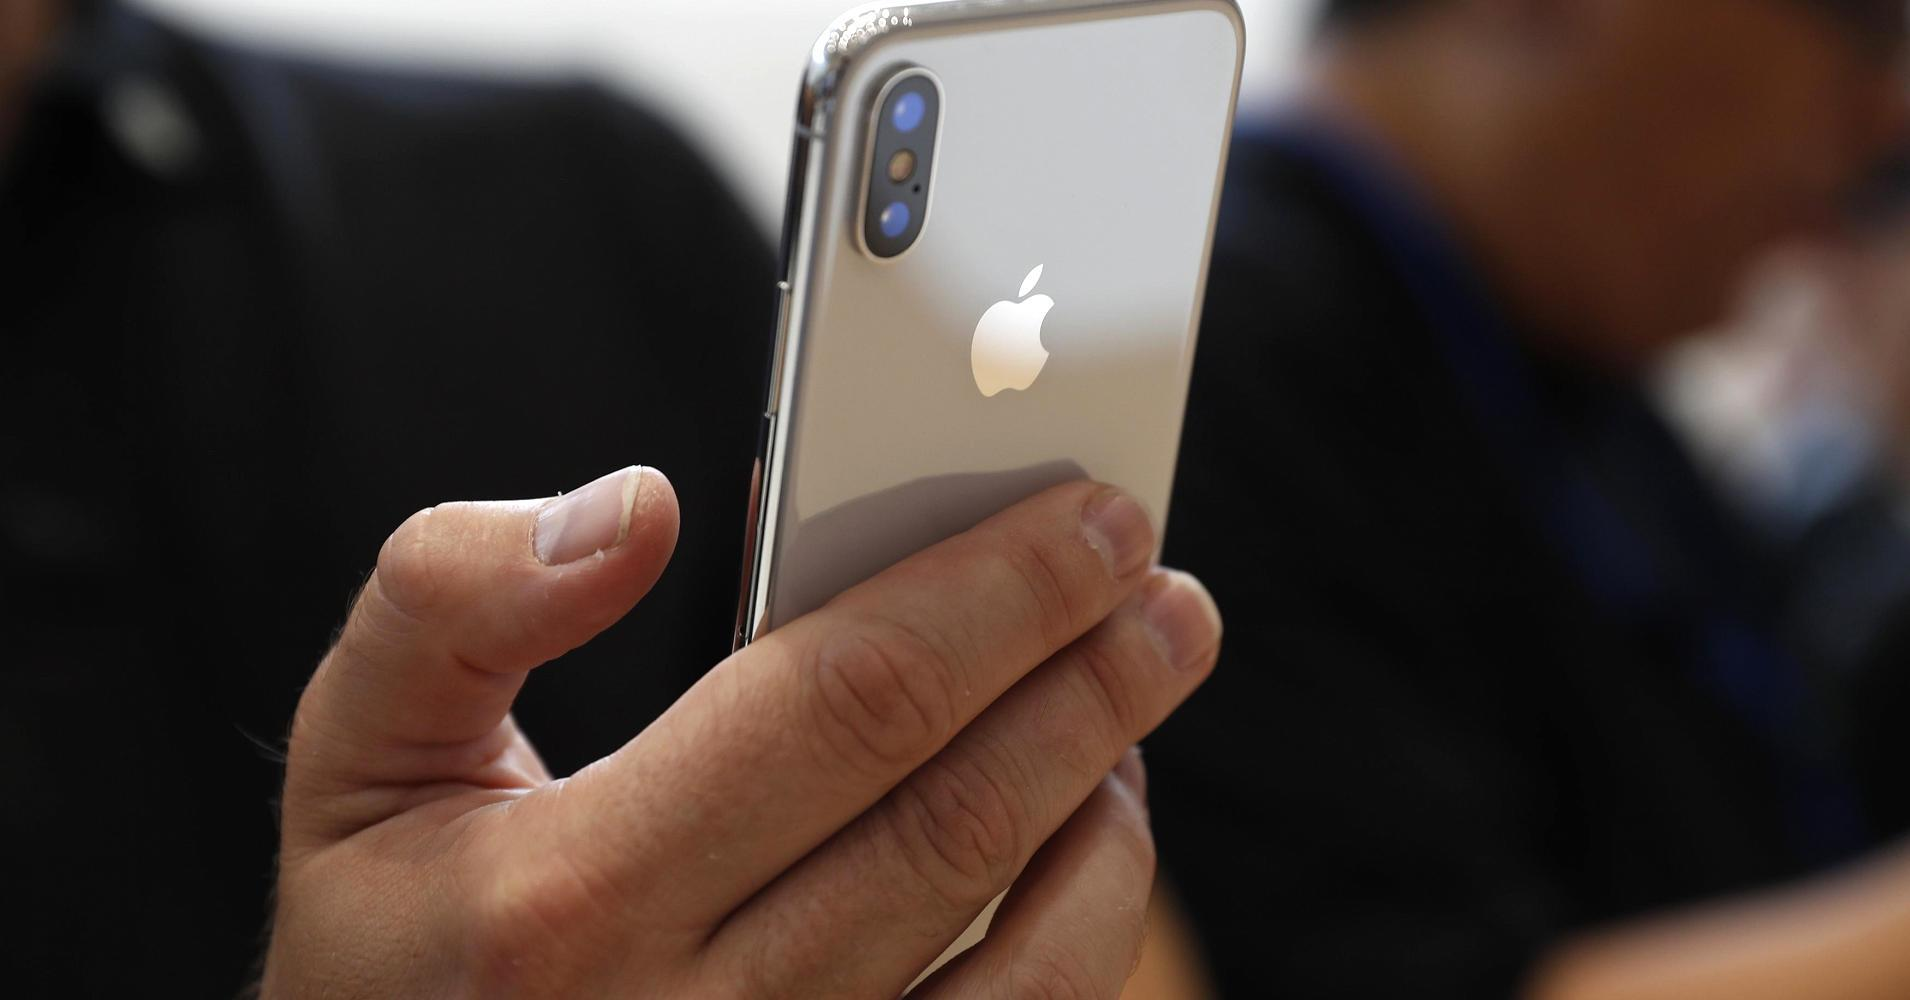 iPhone X (iPhone 10) in Ghana, Kenya, Nigeria: Buy, Swap, Price, Specs